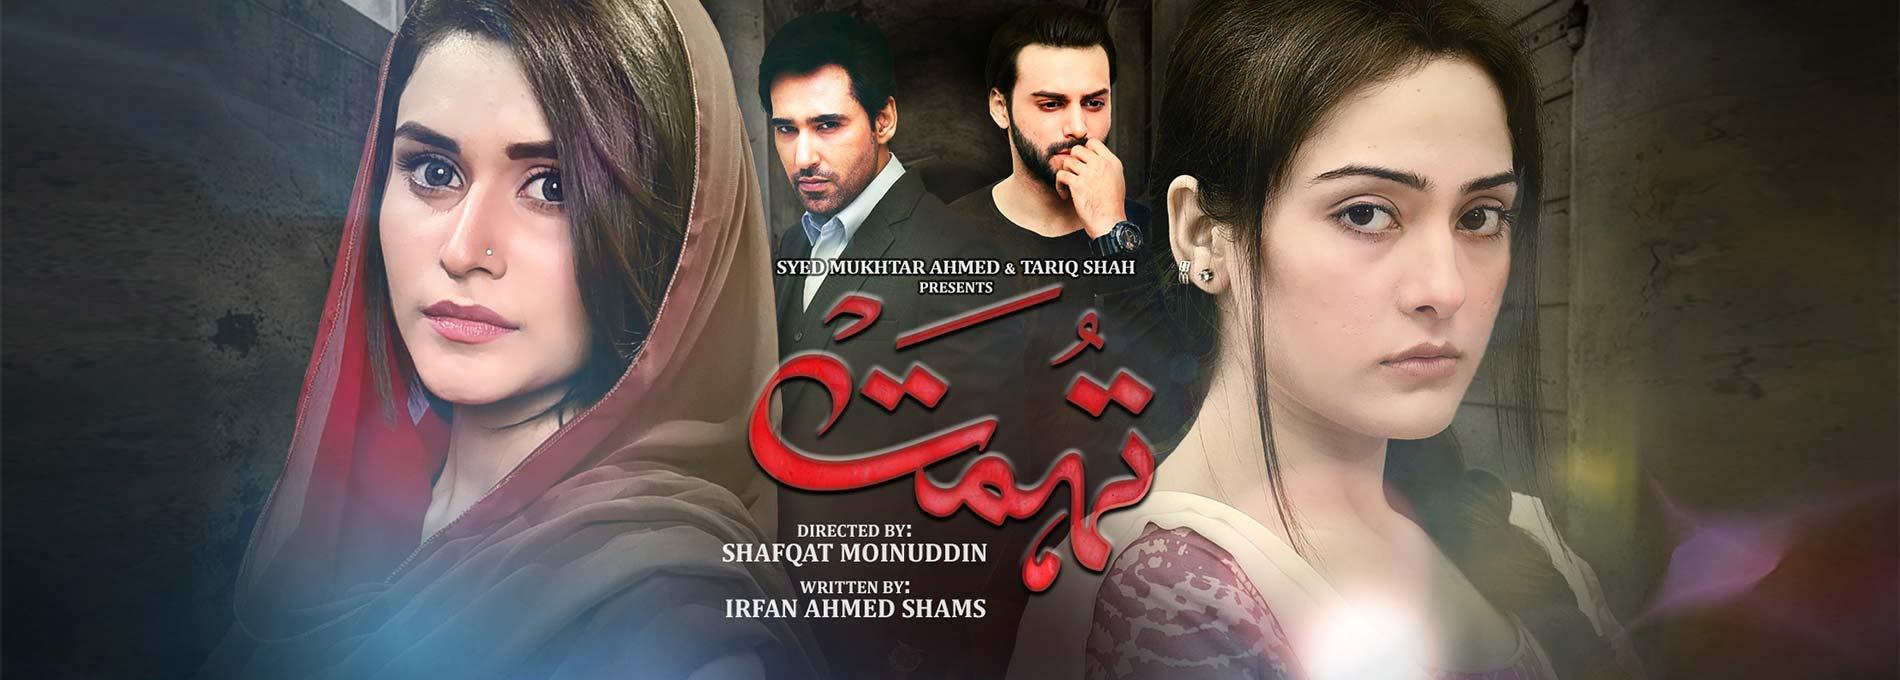 Tohmat - GEO Tv Drama poster image